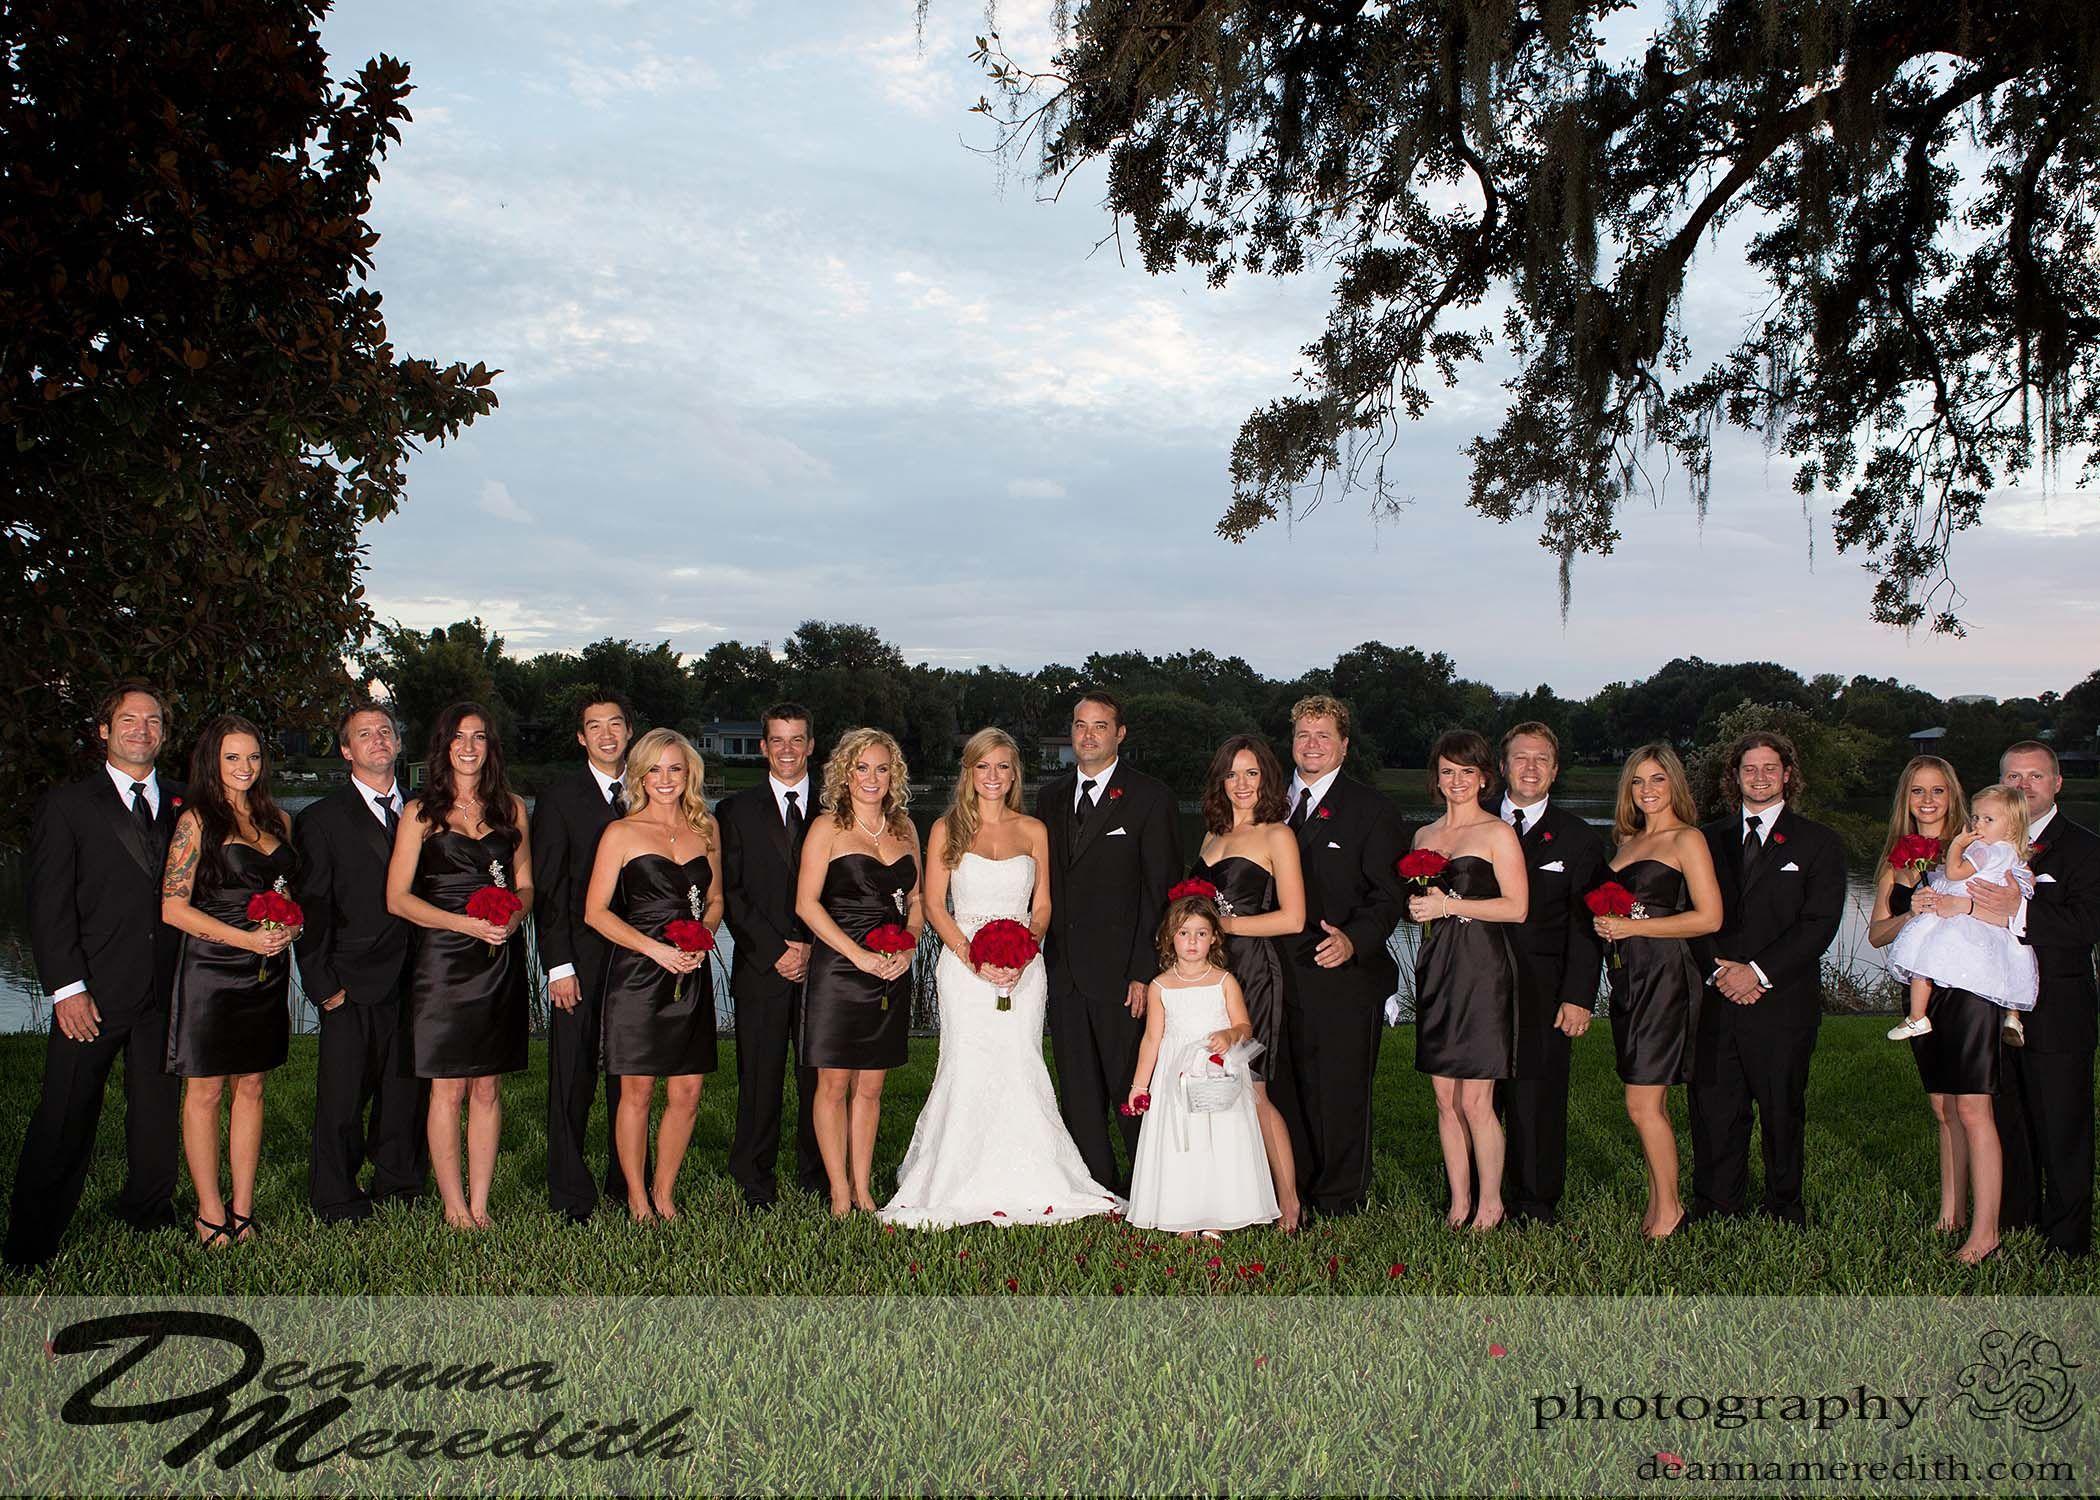 wedding at science center Lds wedding, Wedding, Science